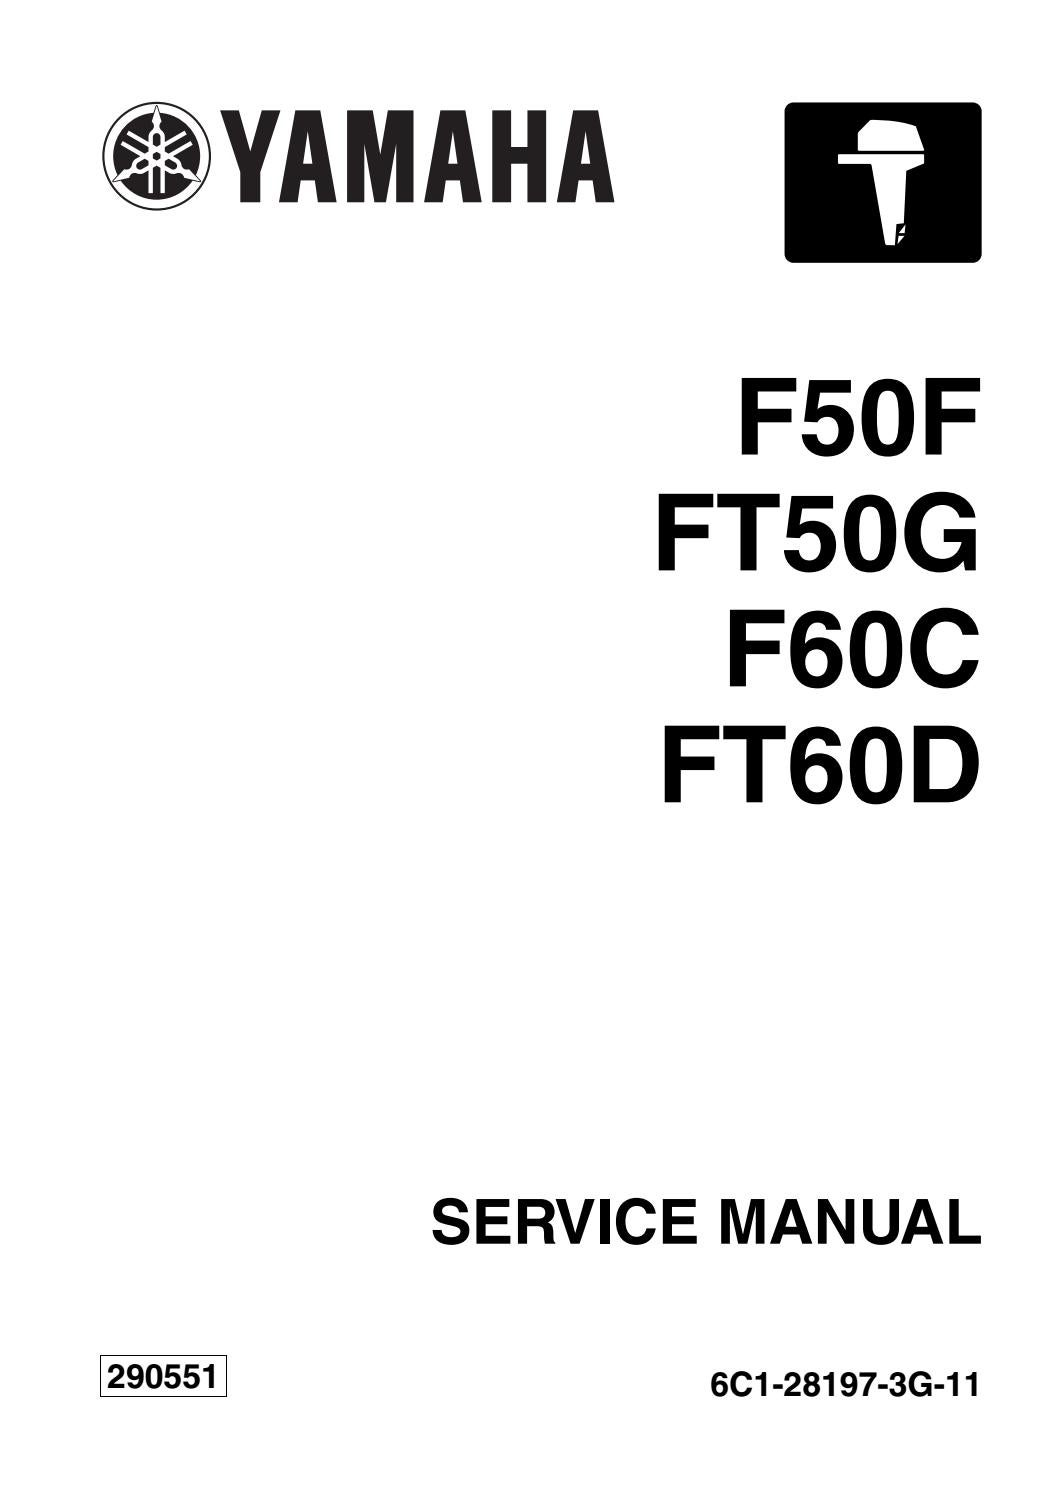 wiring diagram yamaha f60